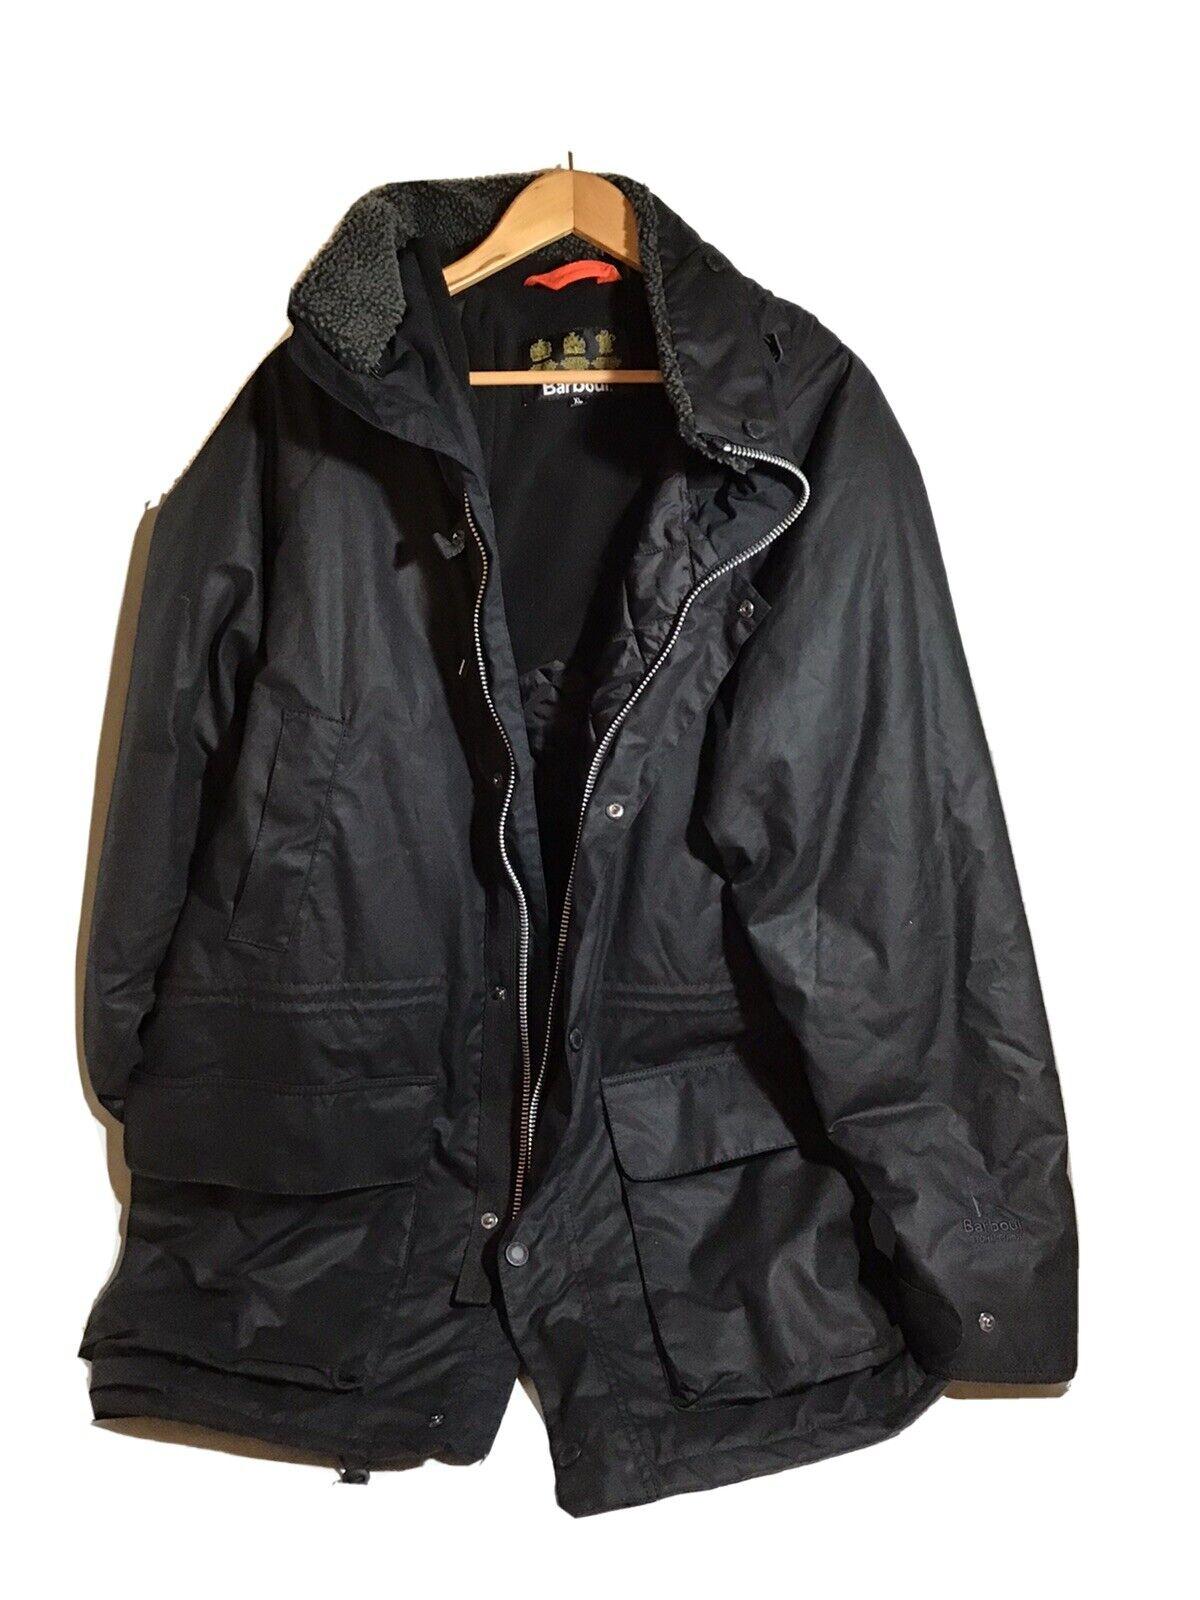 Barbour Fenton Wax Jacket XL Black - image 1